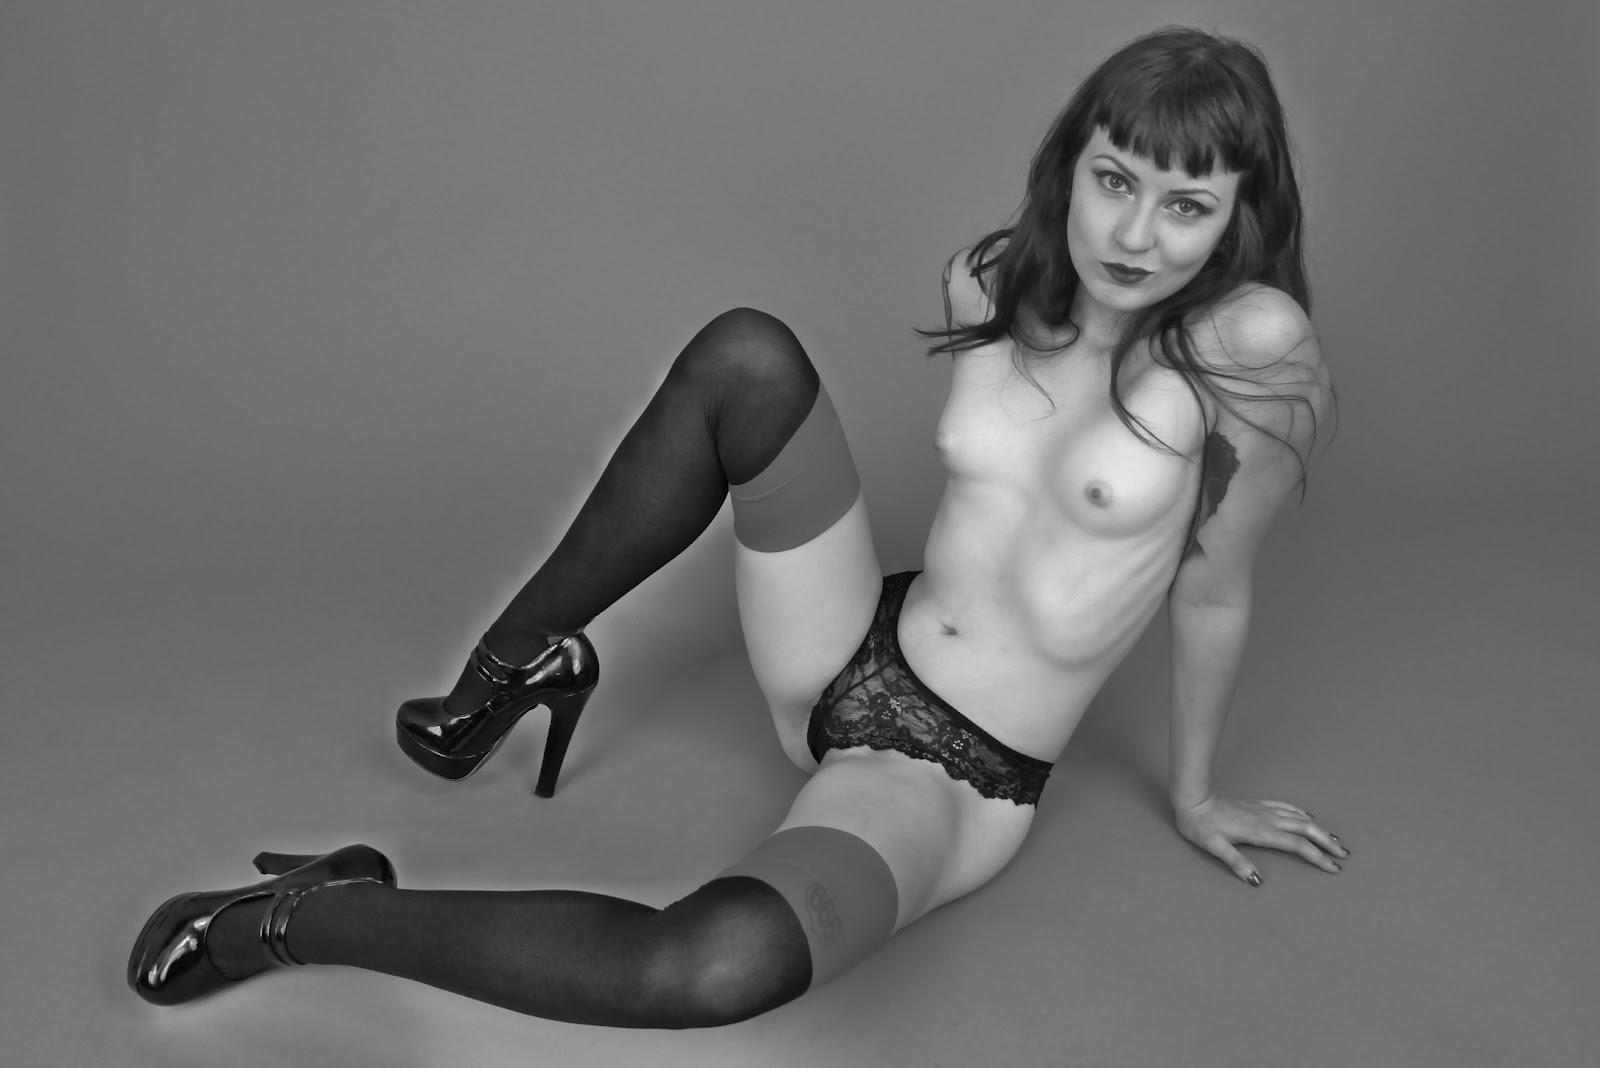 atlanta-dominant-femdom-hot-twin-female-sex